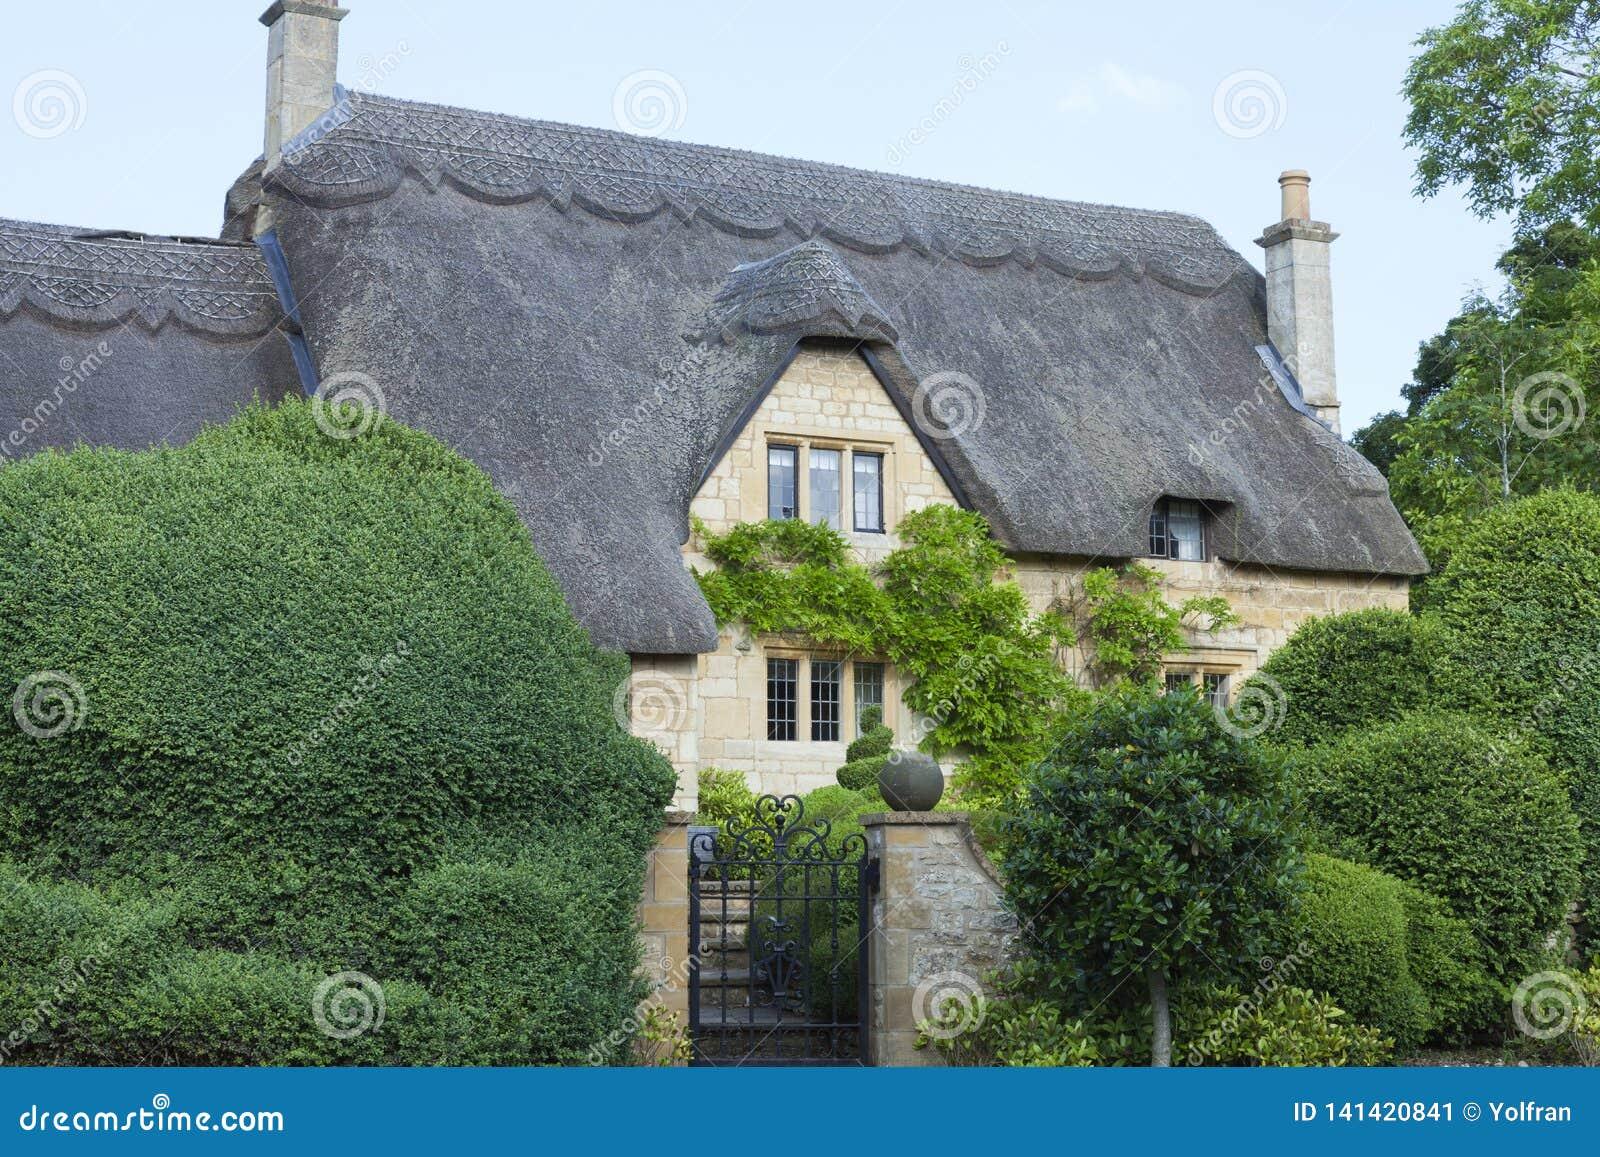 Idyllic Old English House With Topiary Tree Garden Stock Image